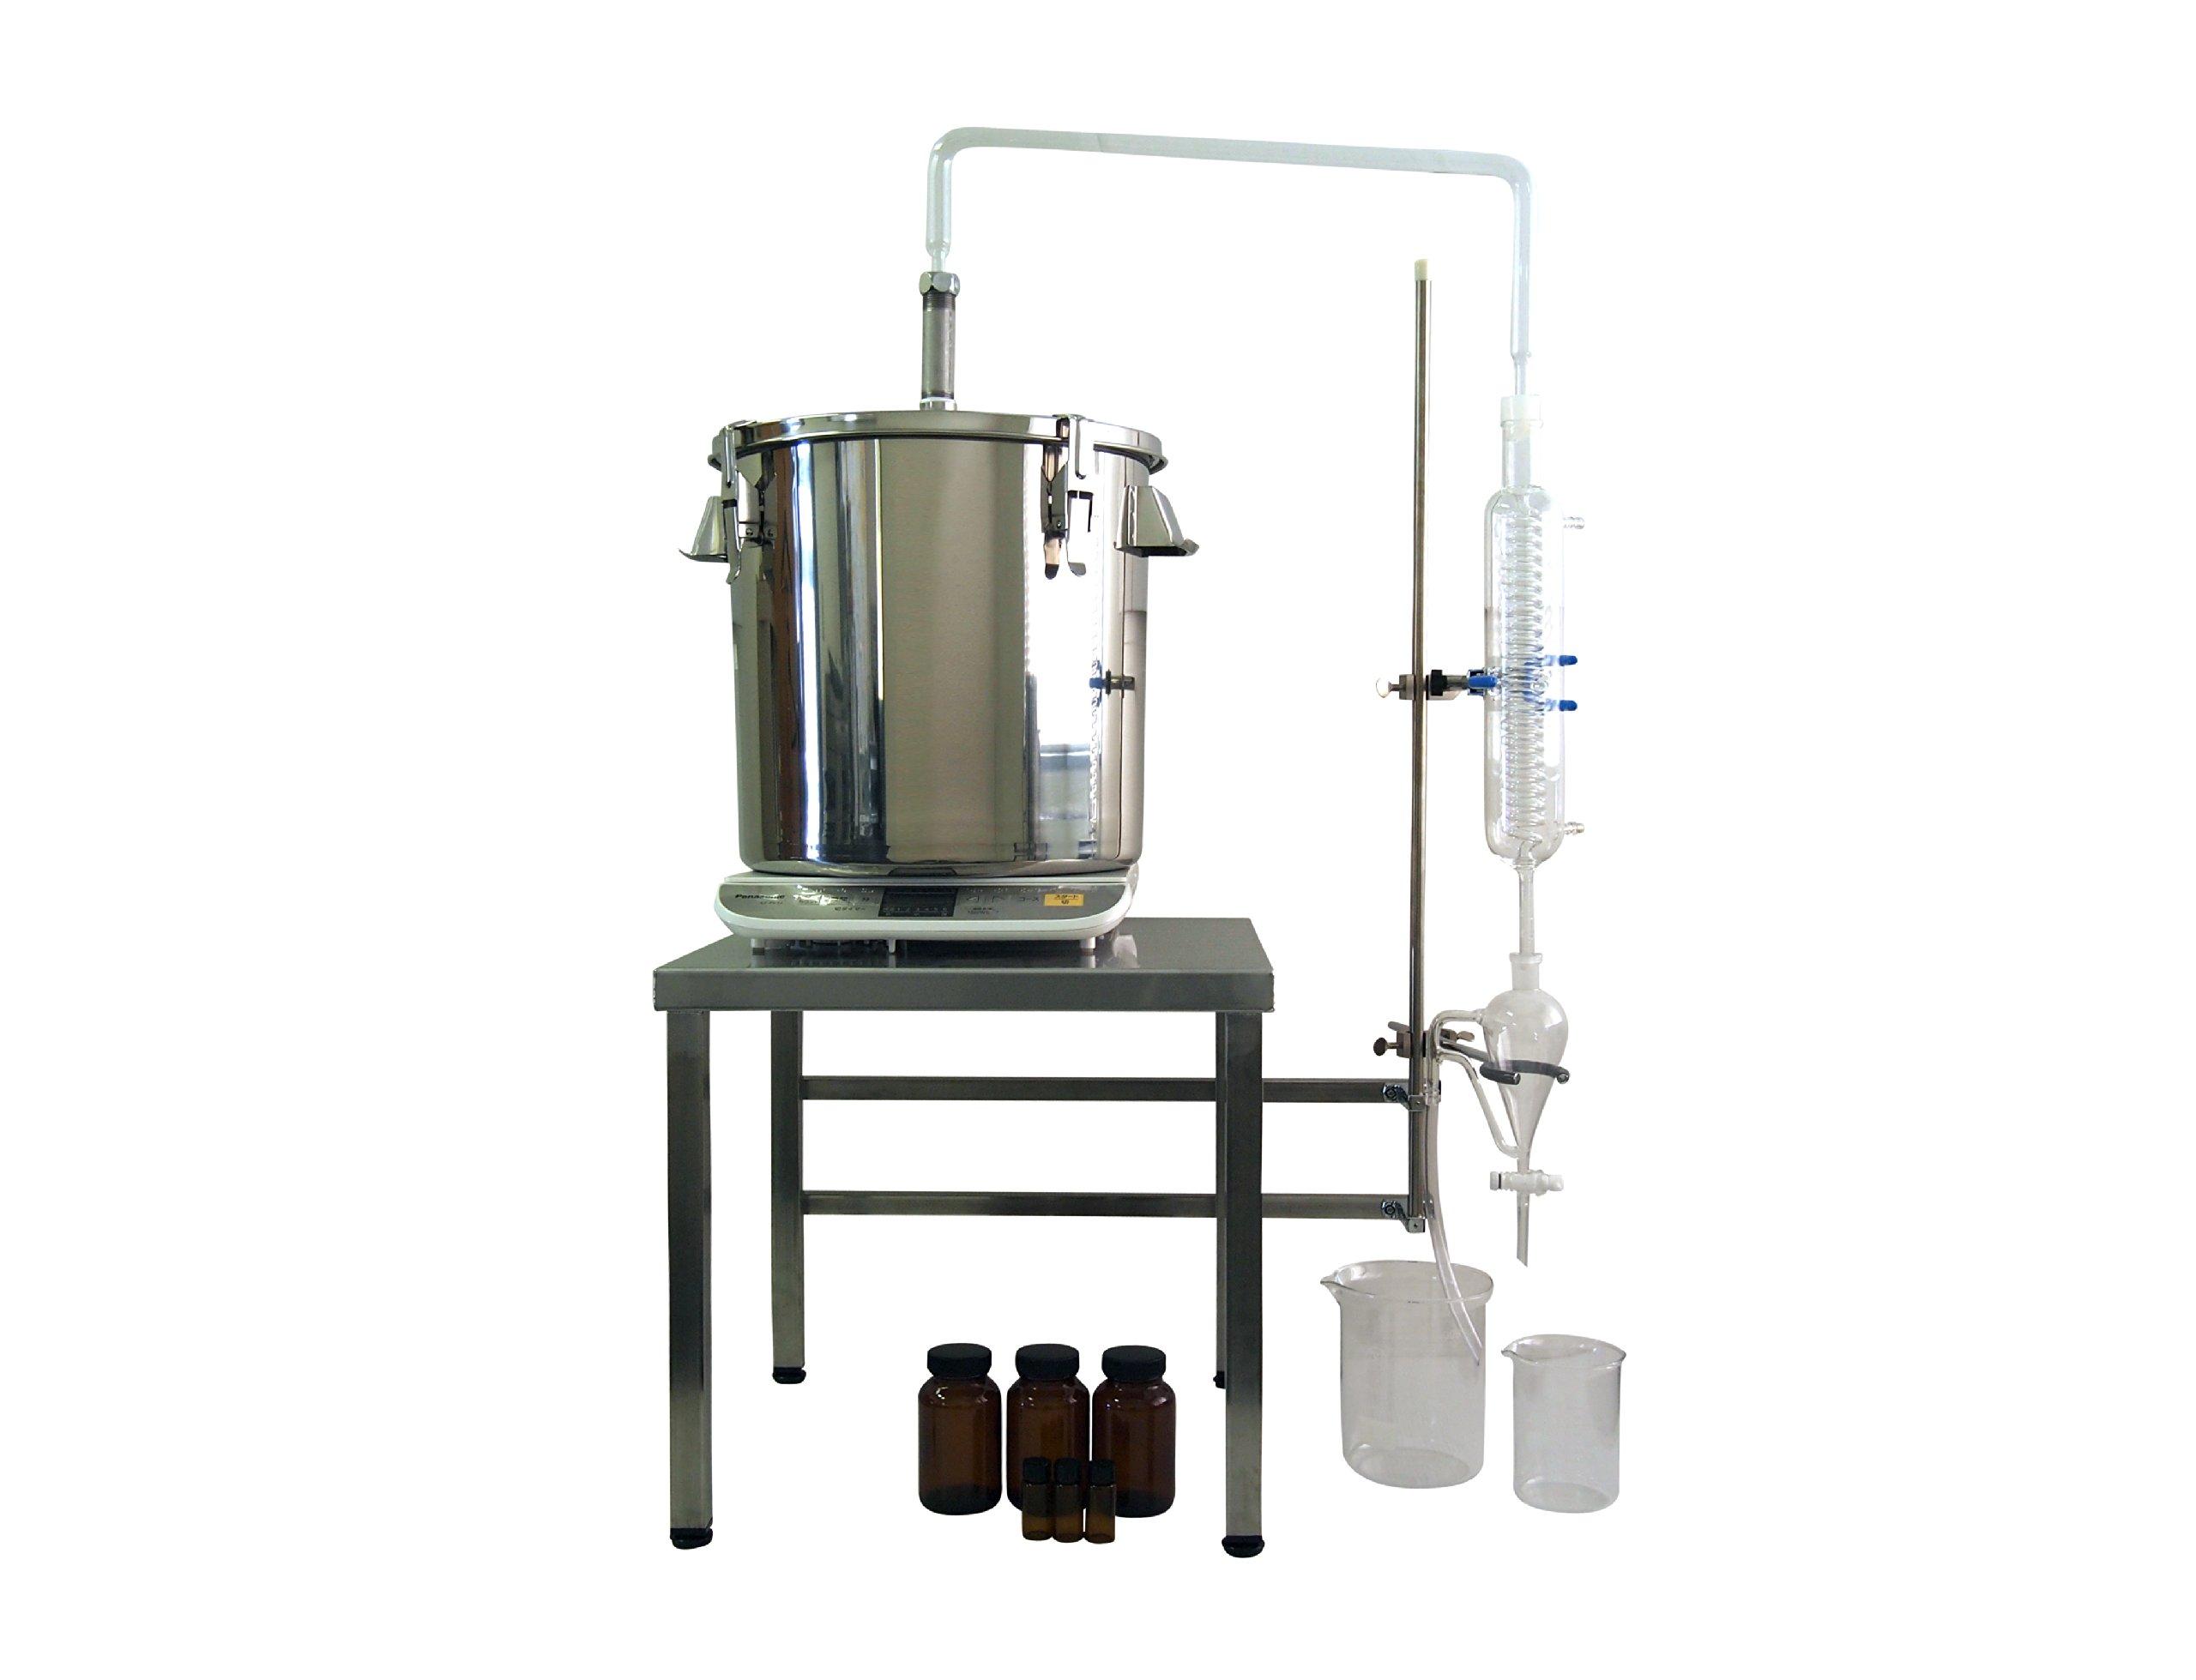 PureStiller HC/M Home Distillation Kit